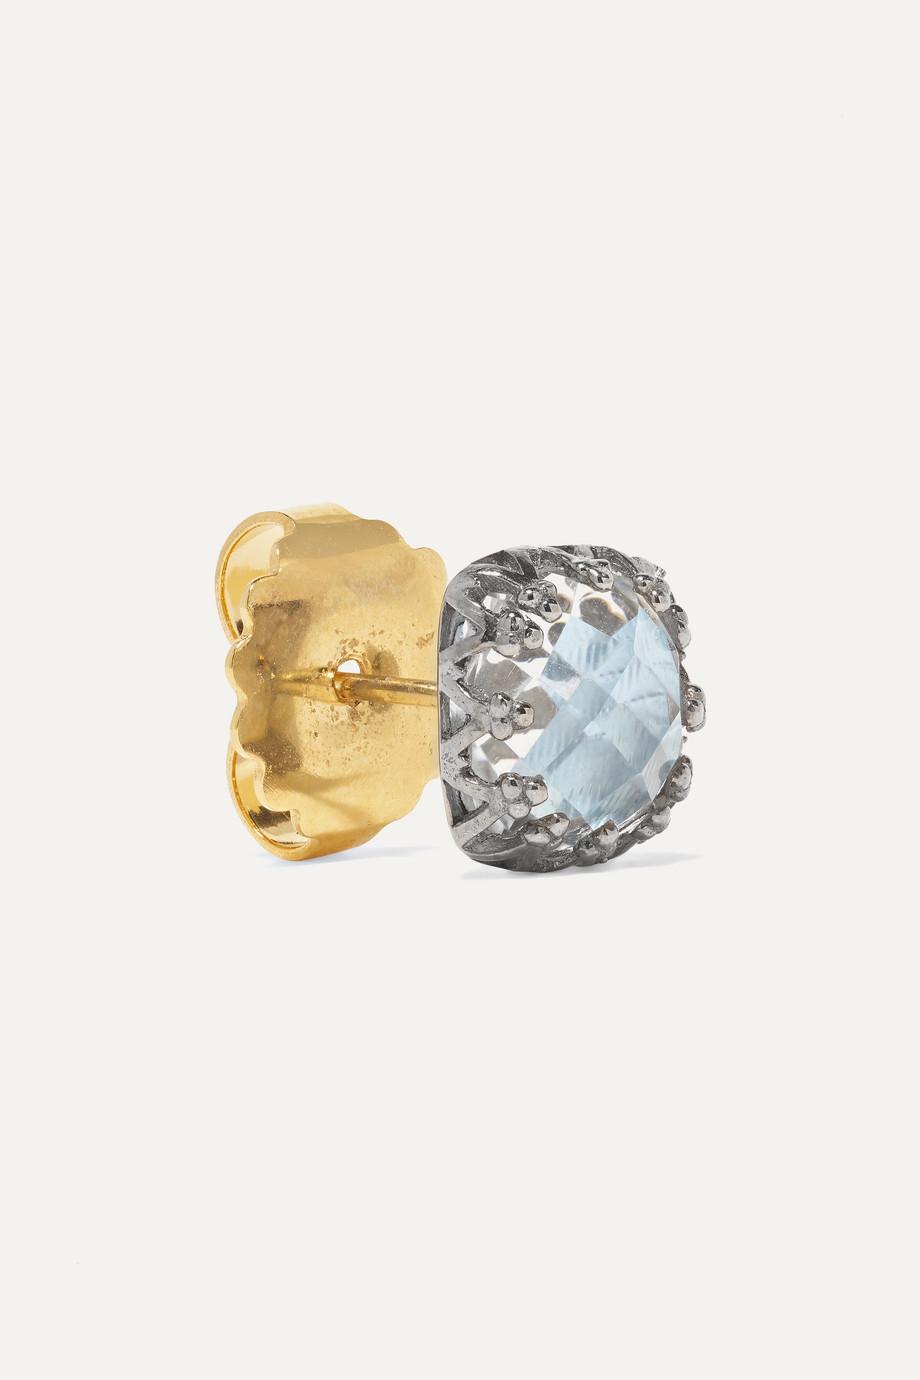 Larkspur & Hawk Jane small rhodium-dipped quartz earrings